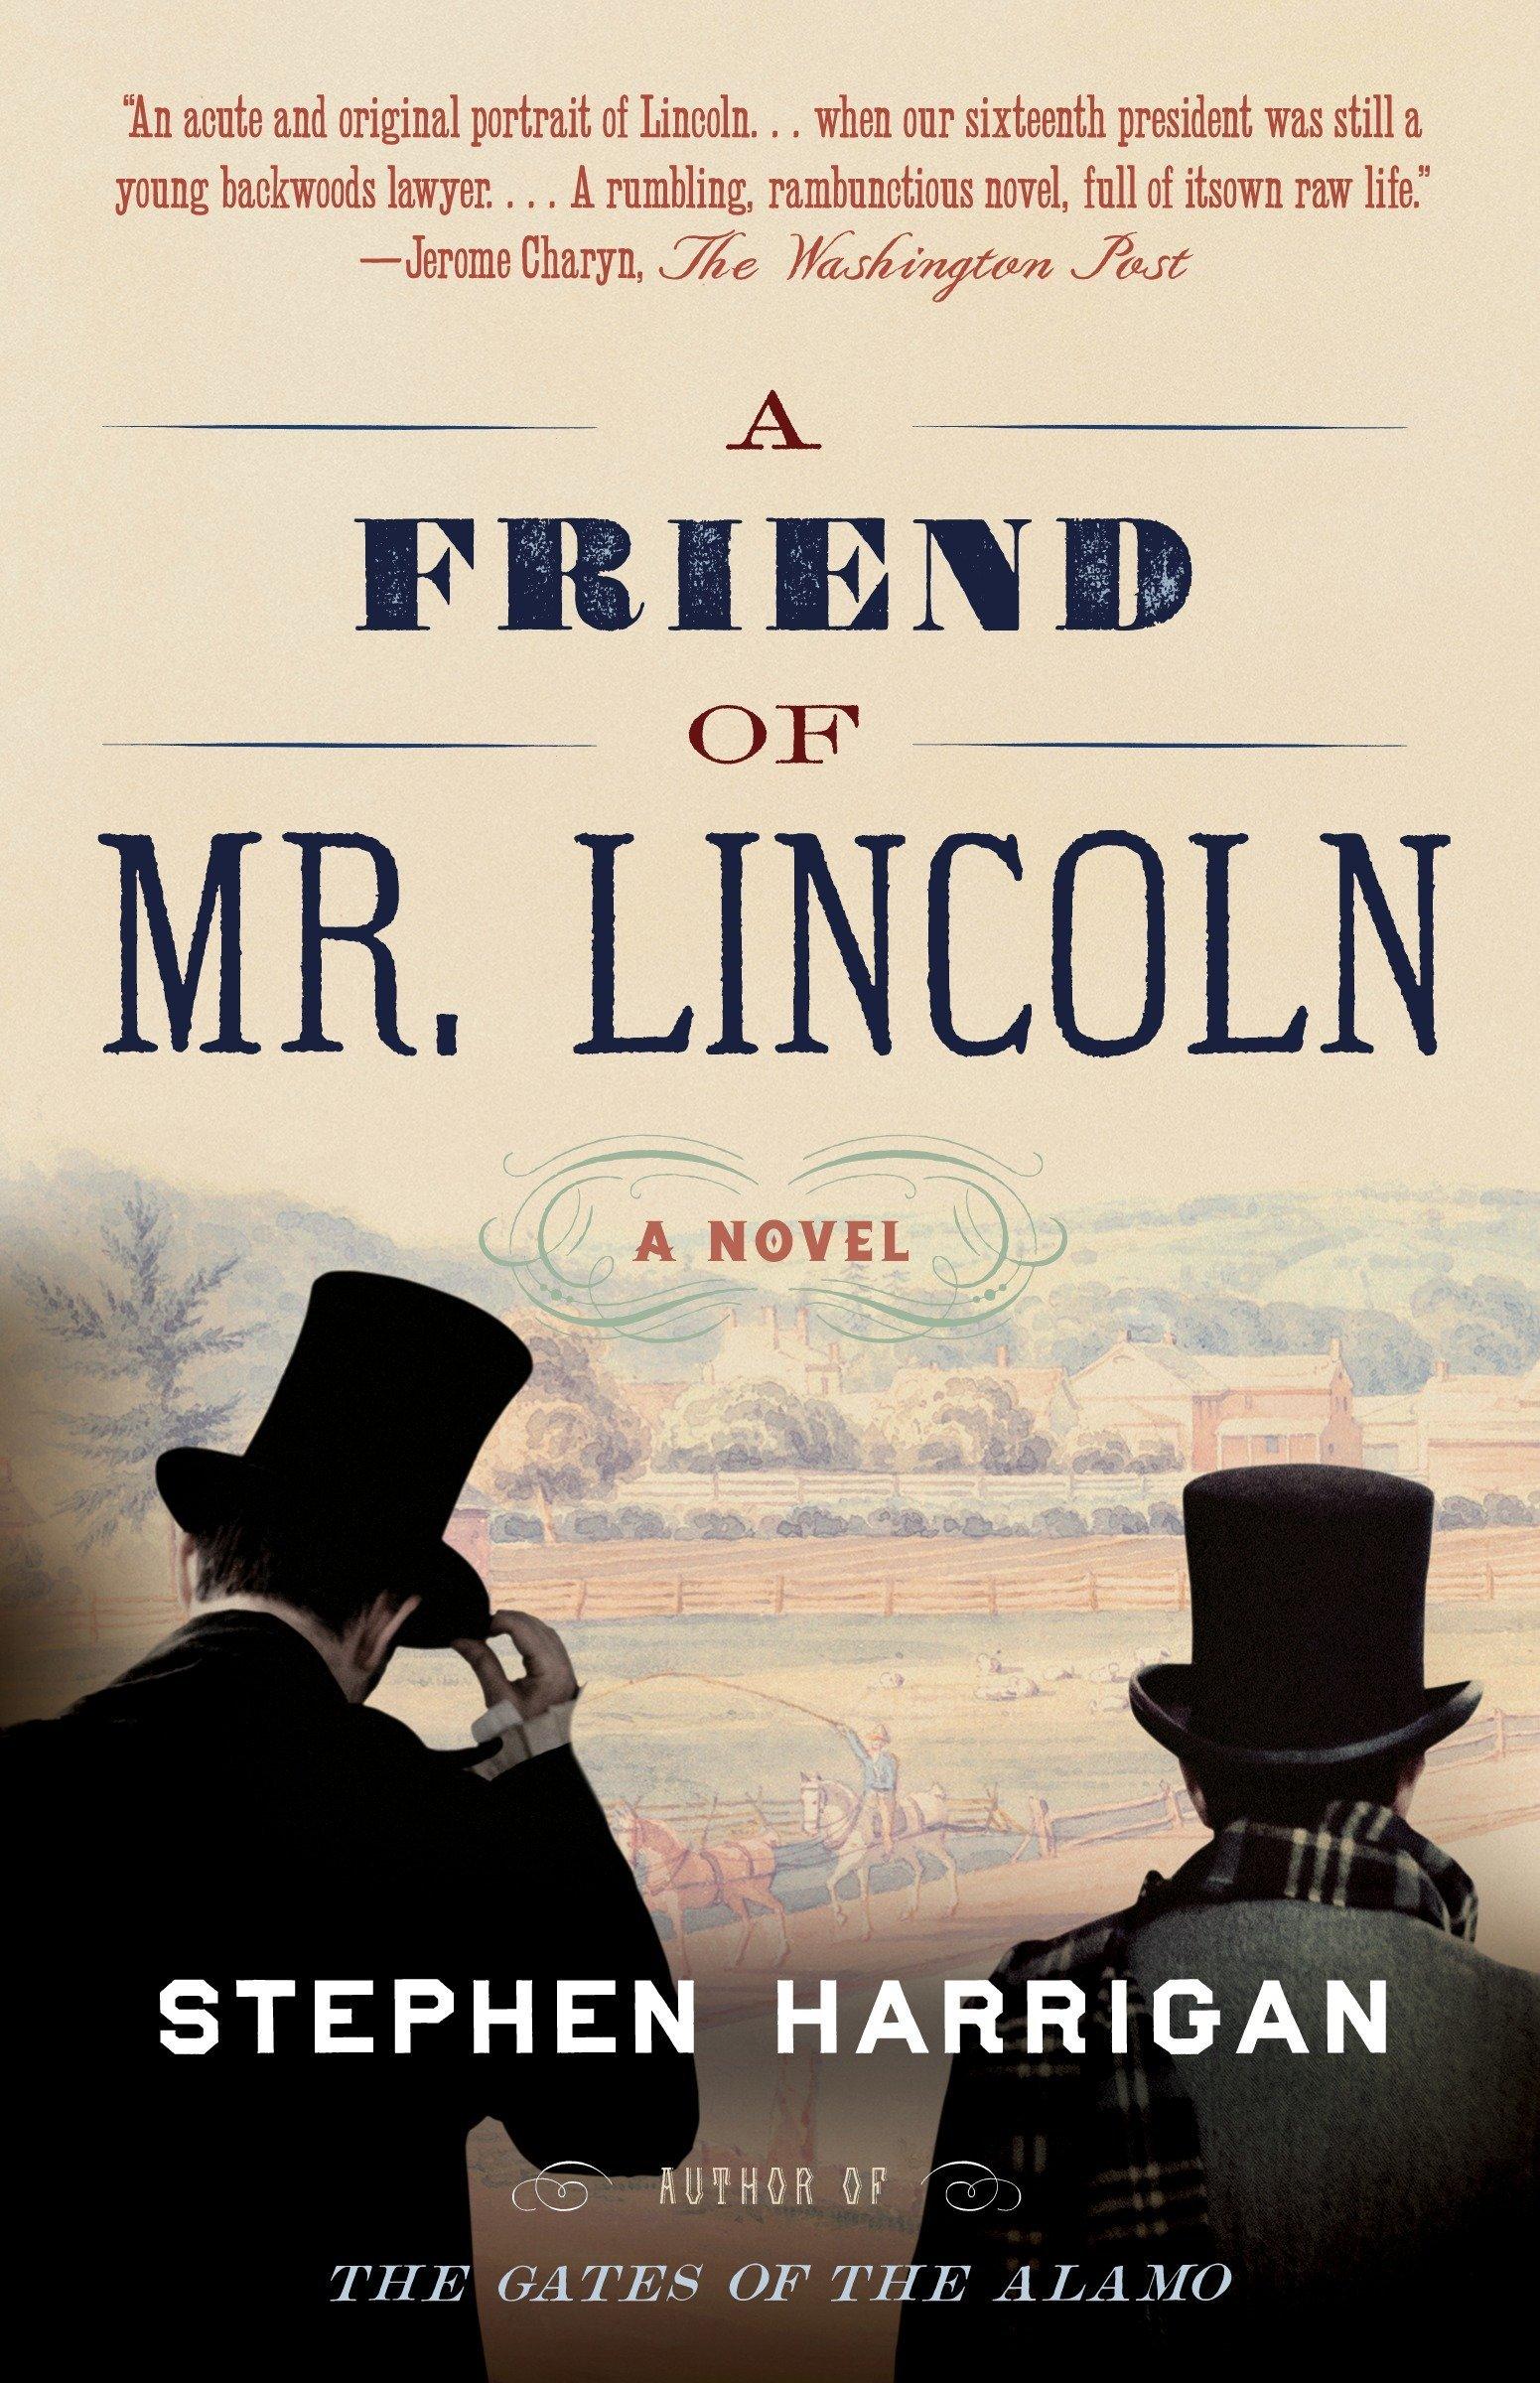 A Friend of Mr. Lincoln Book Cover